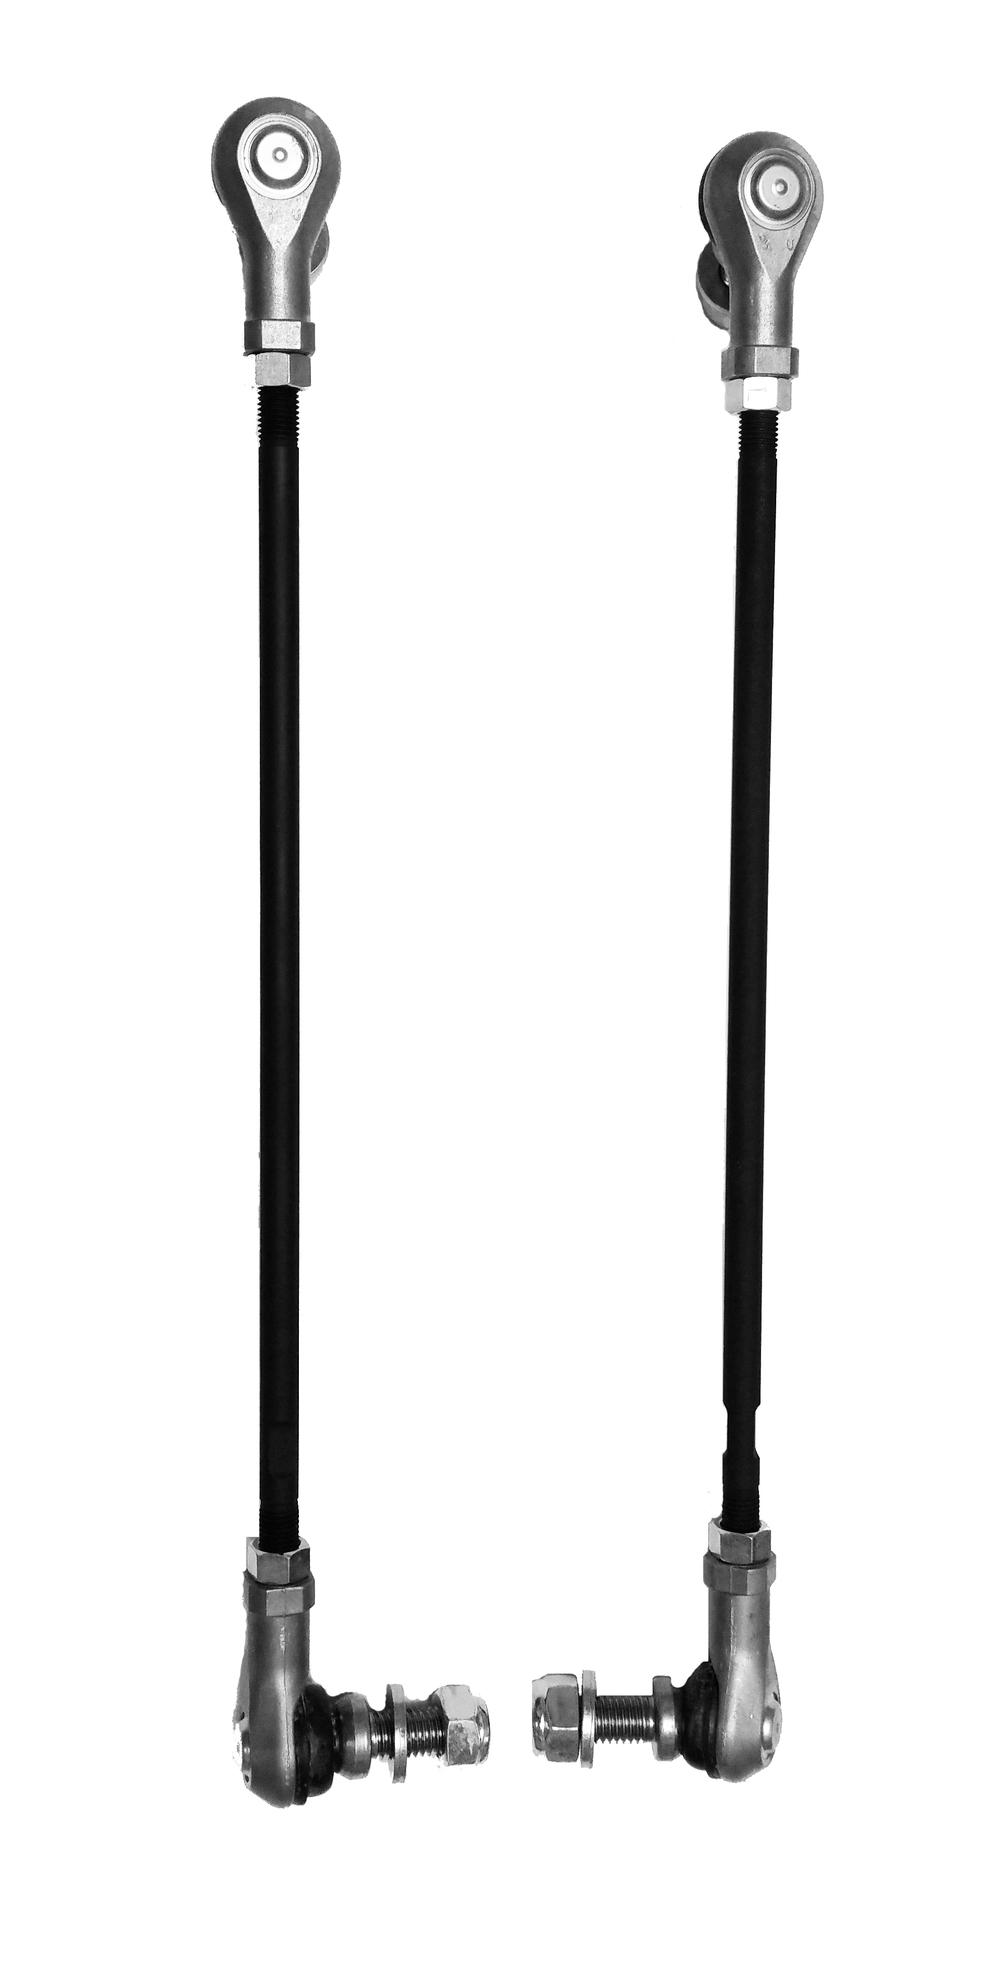 JPSS Camaro OEM Quiet  High Efficiency Adjustable Endlinks with 12mm Ball Studs